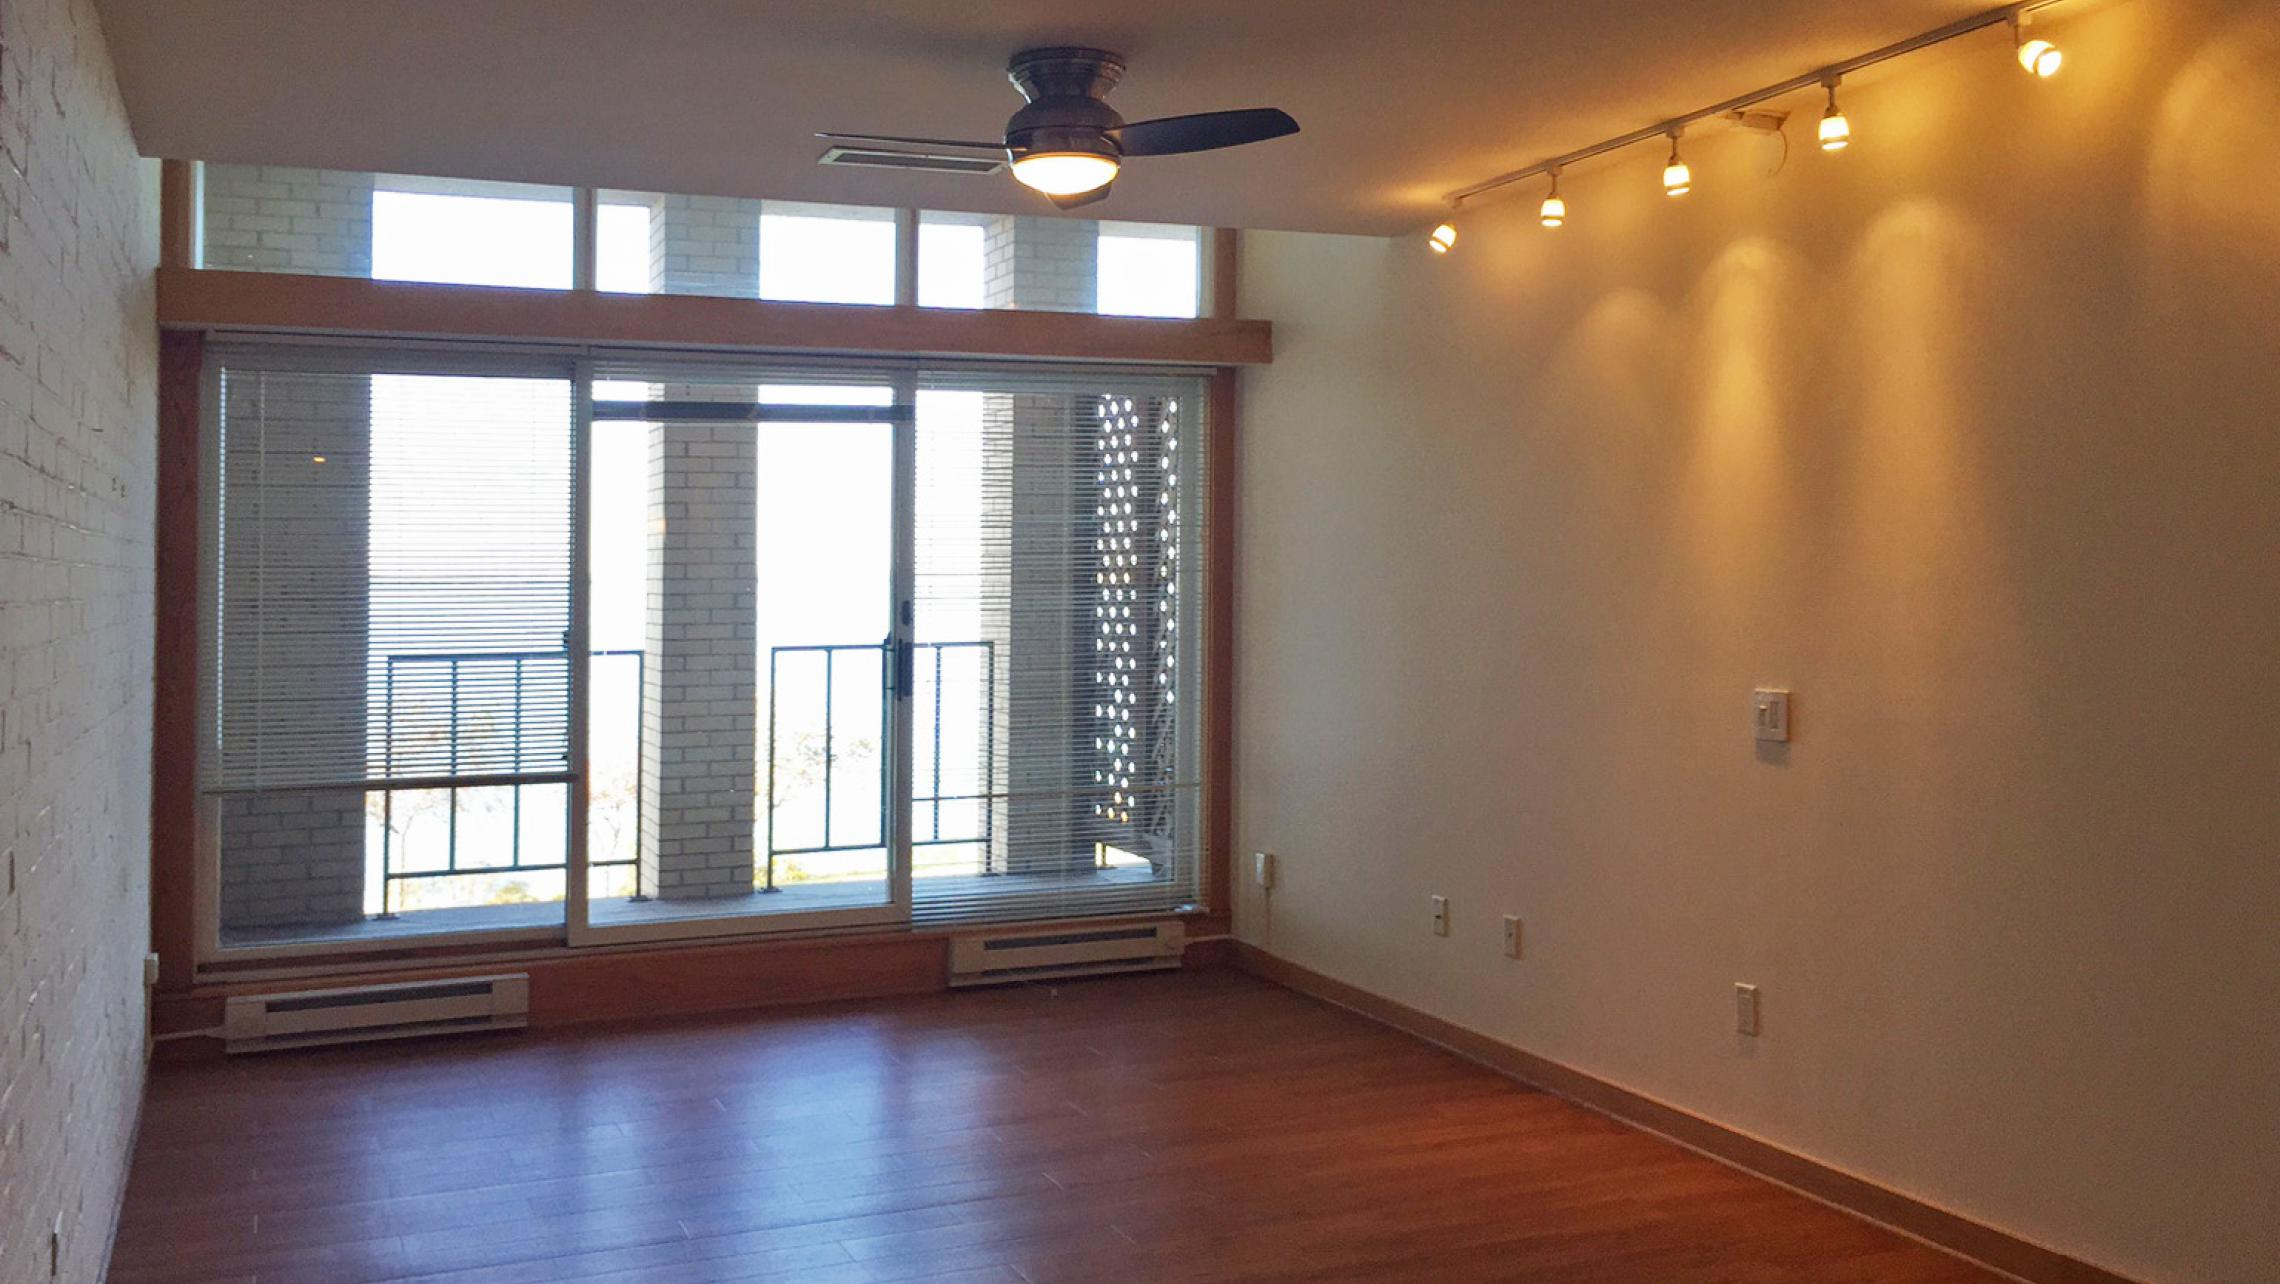 ULI Lincoln School Apartment 205 - Living Room with Lake Mendota View